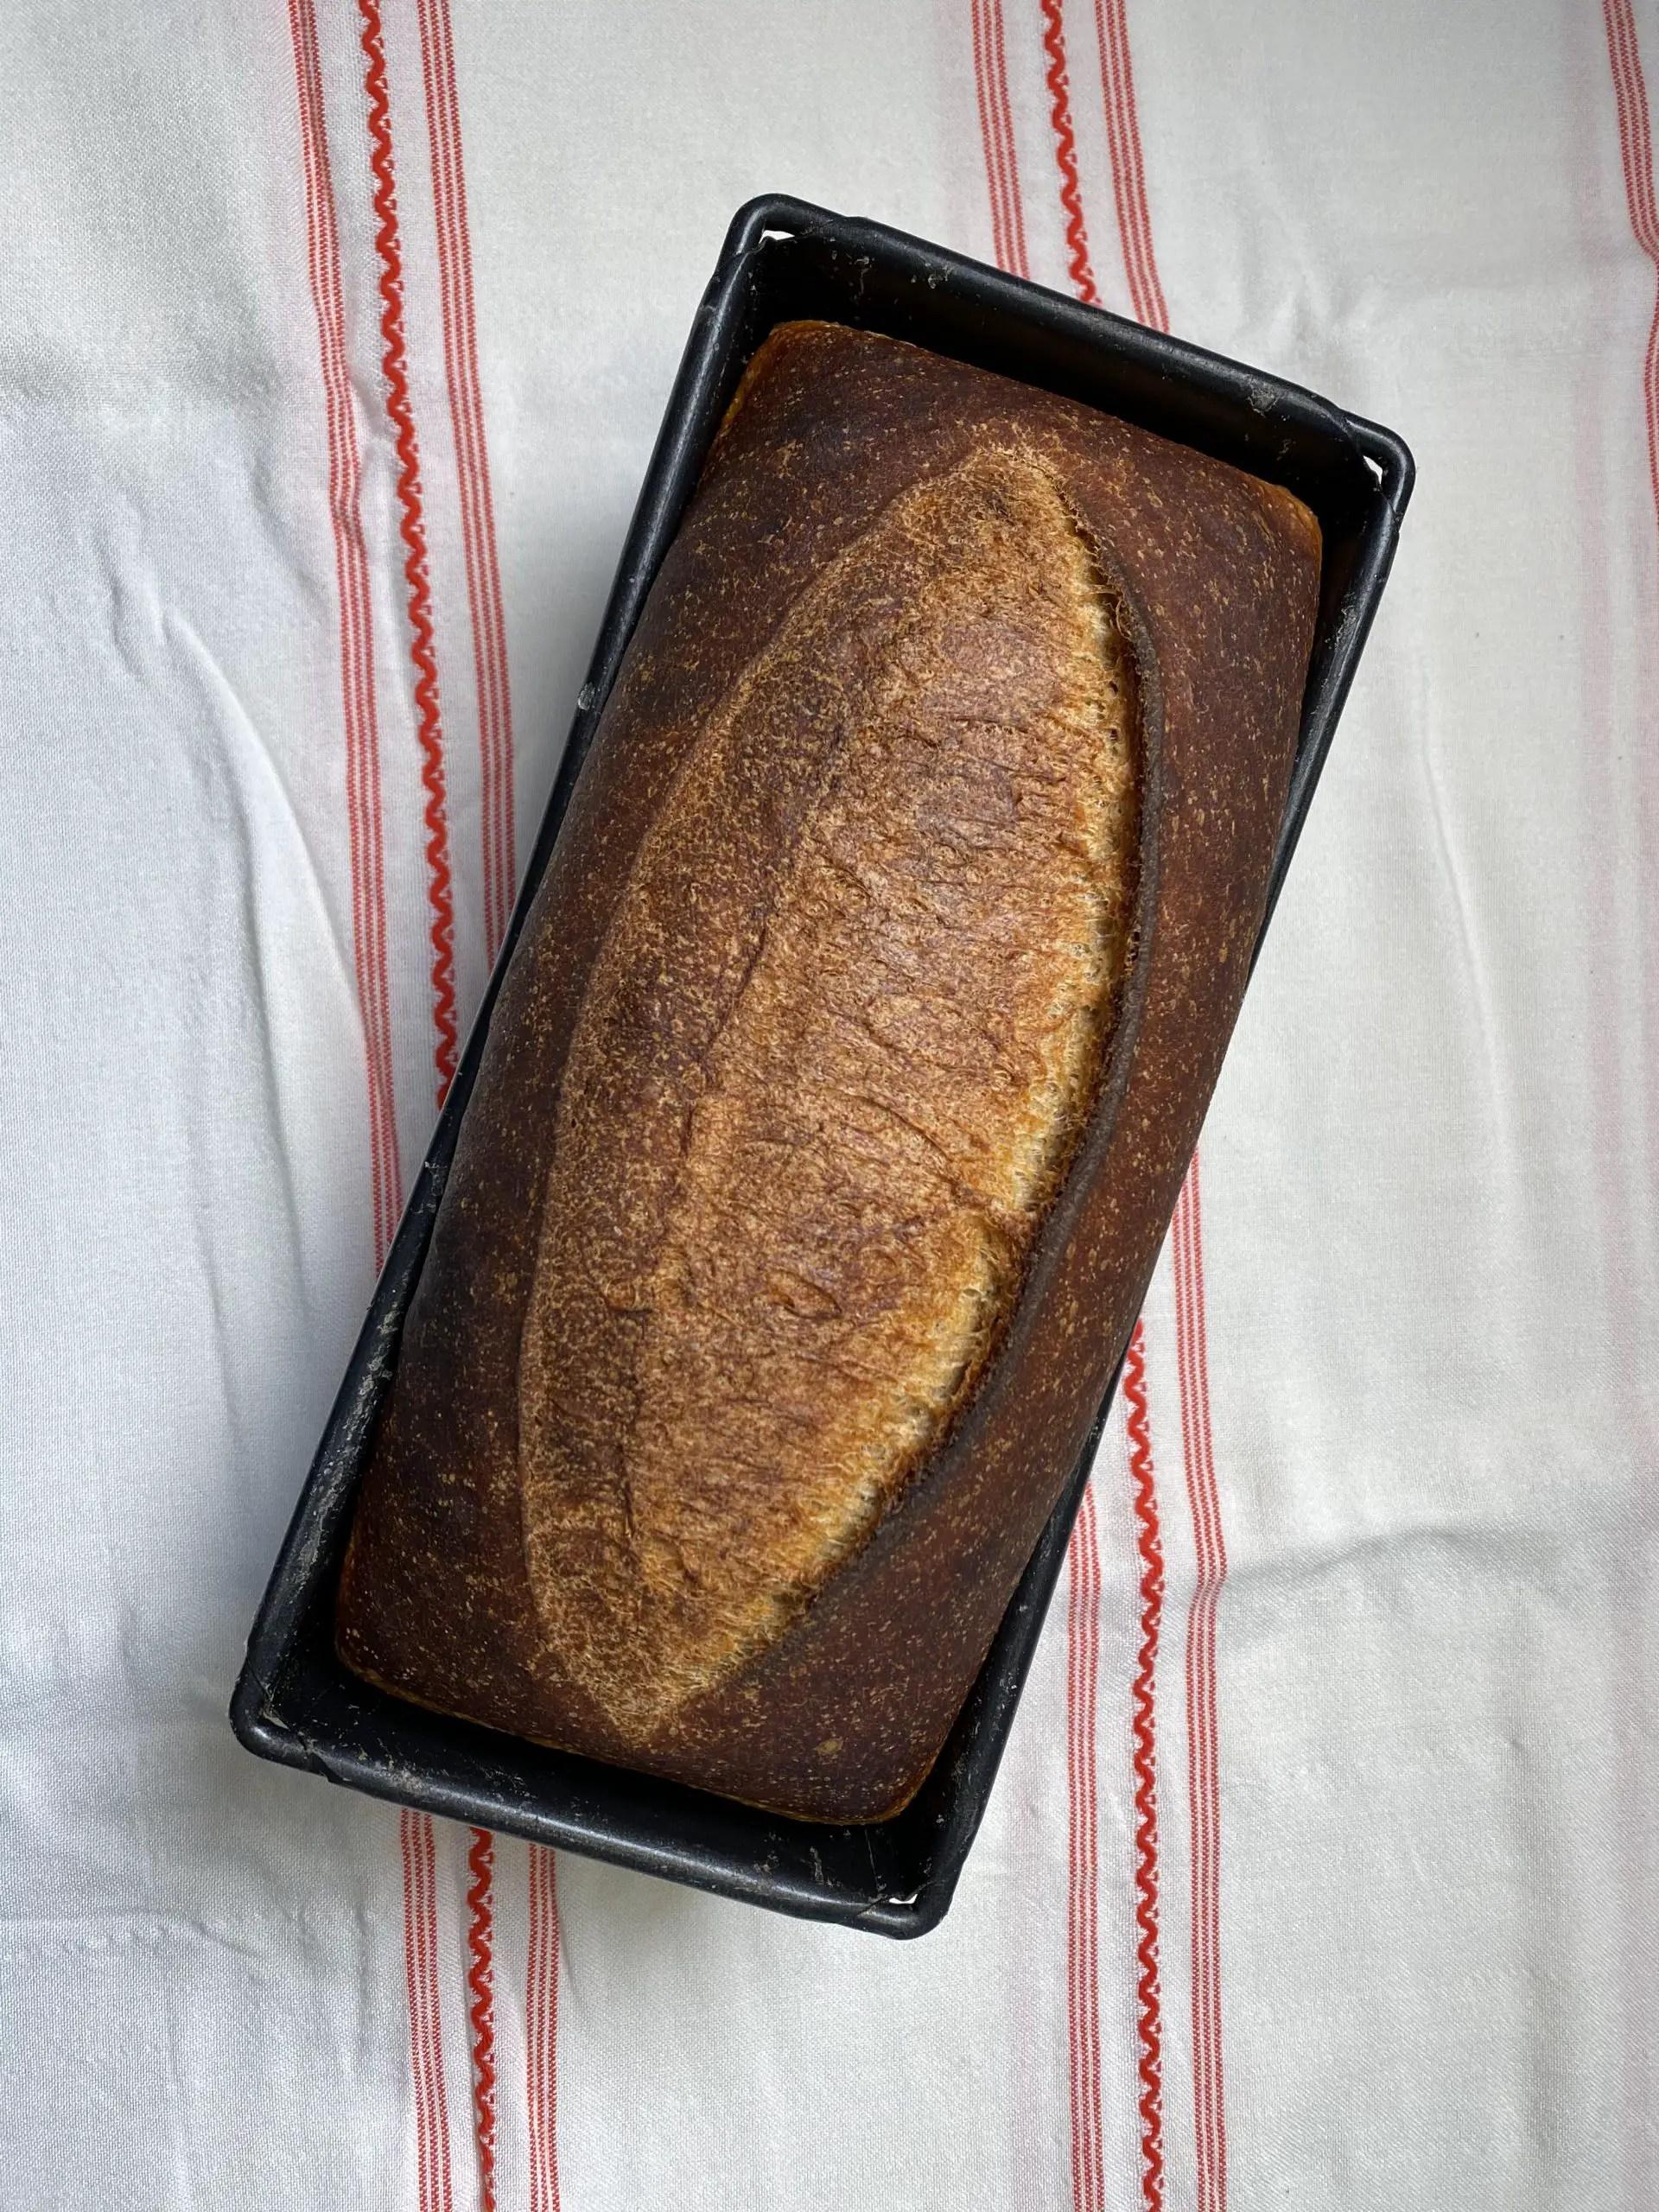 Sourdough tin loaf